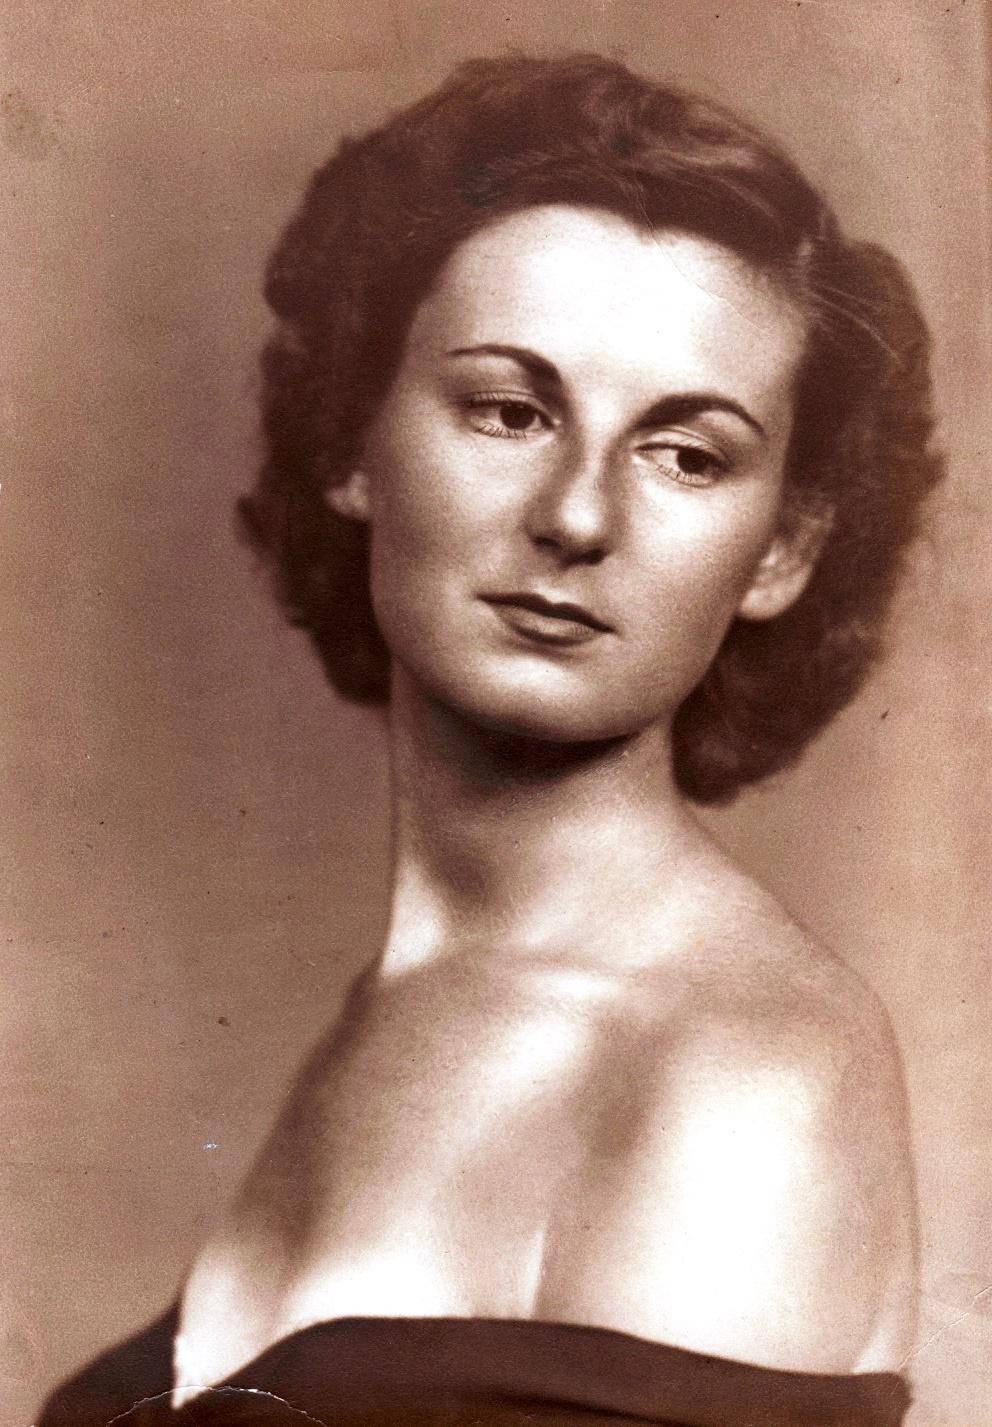 Estelle  Eiger